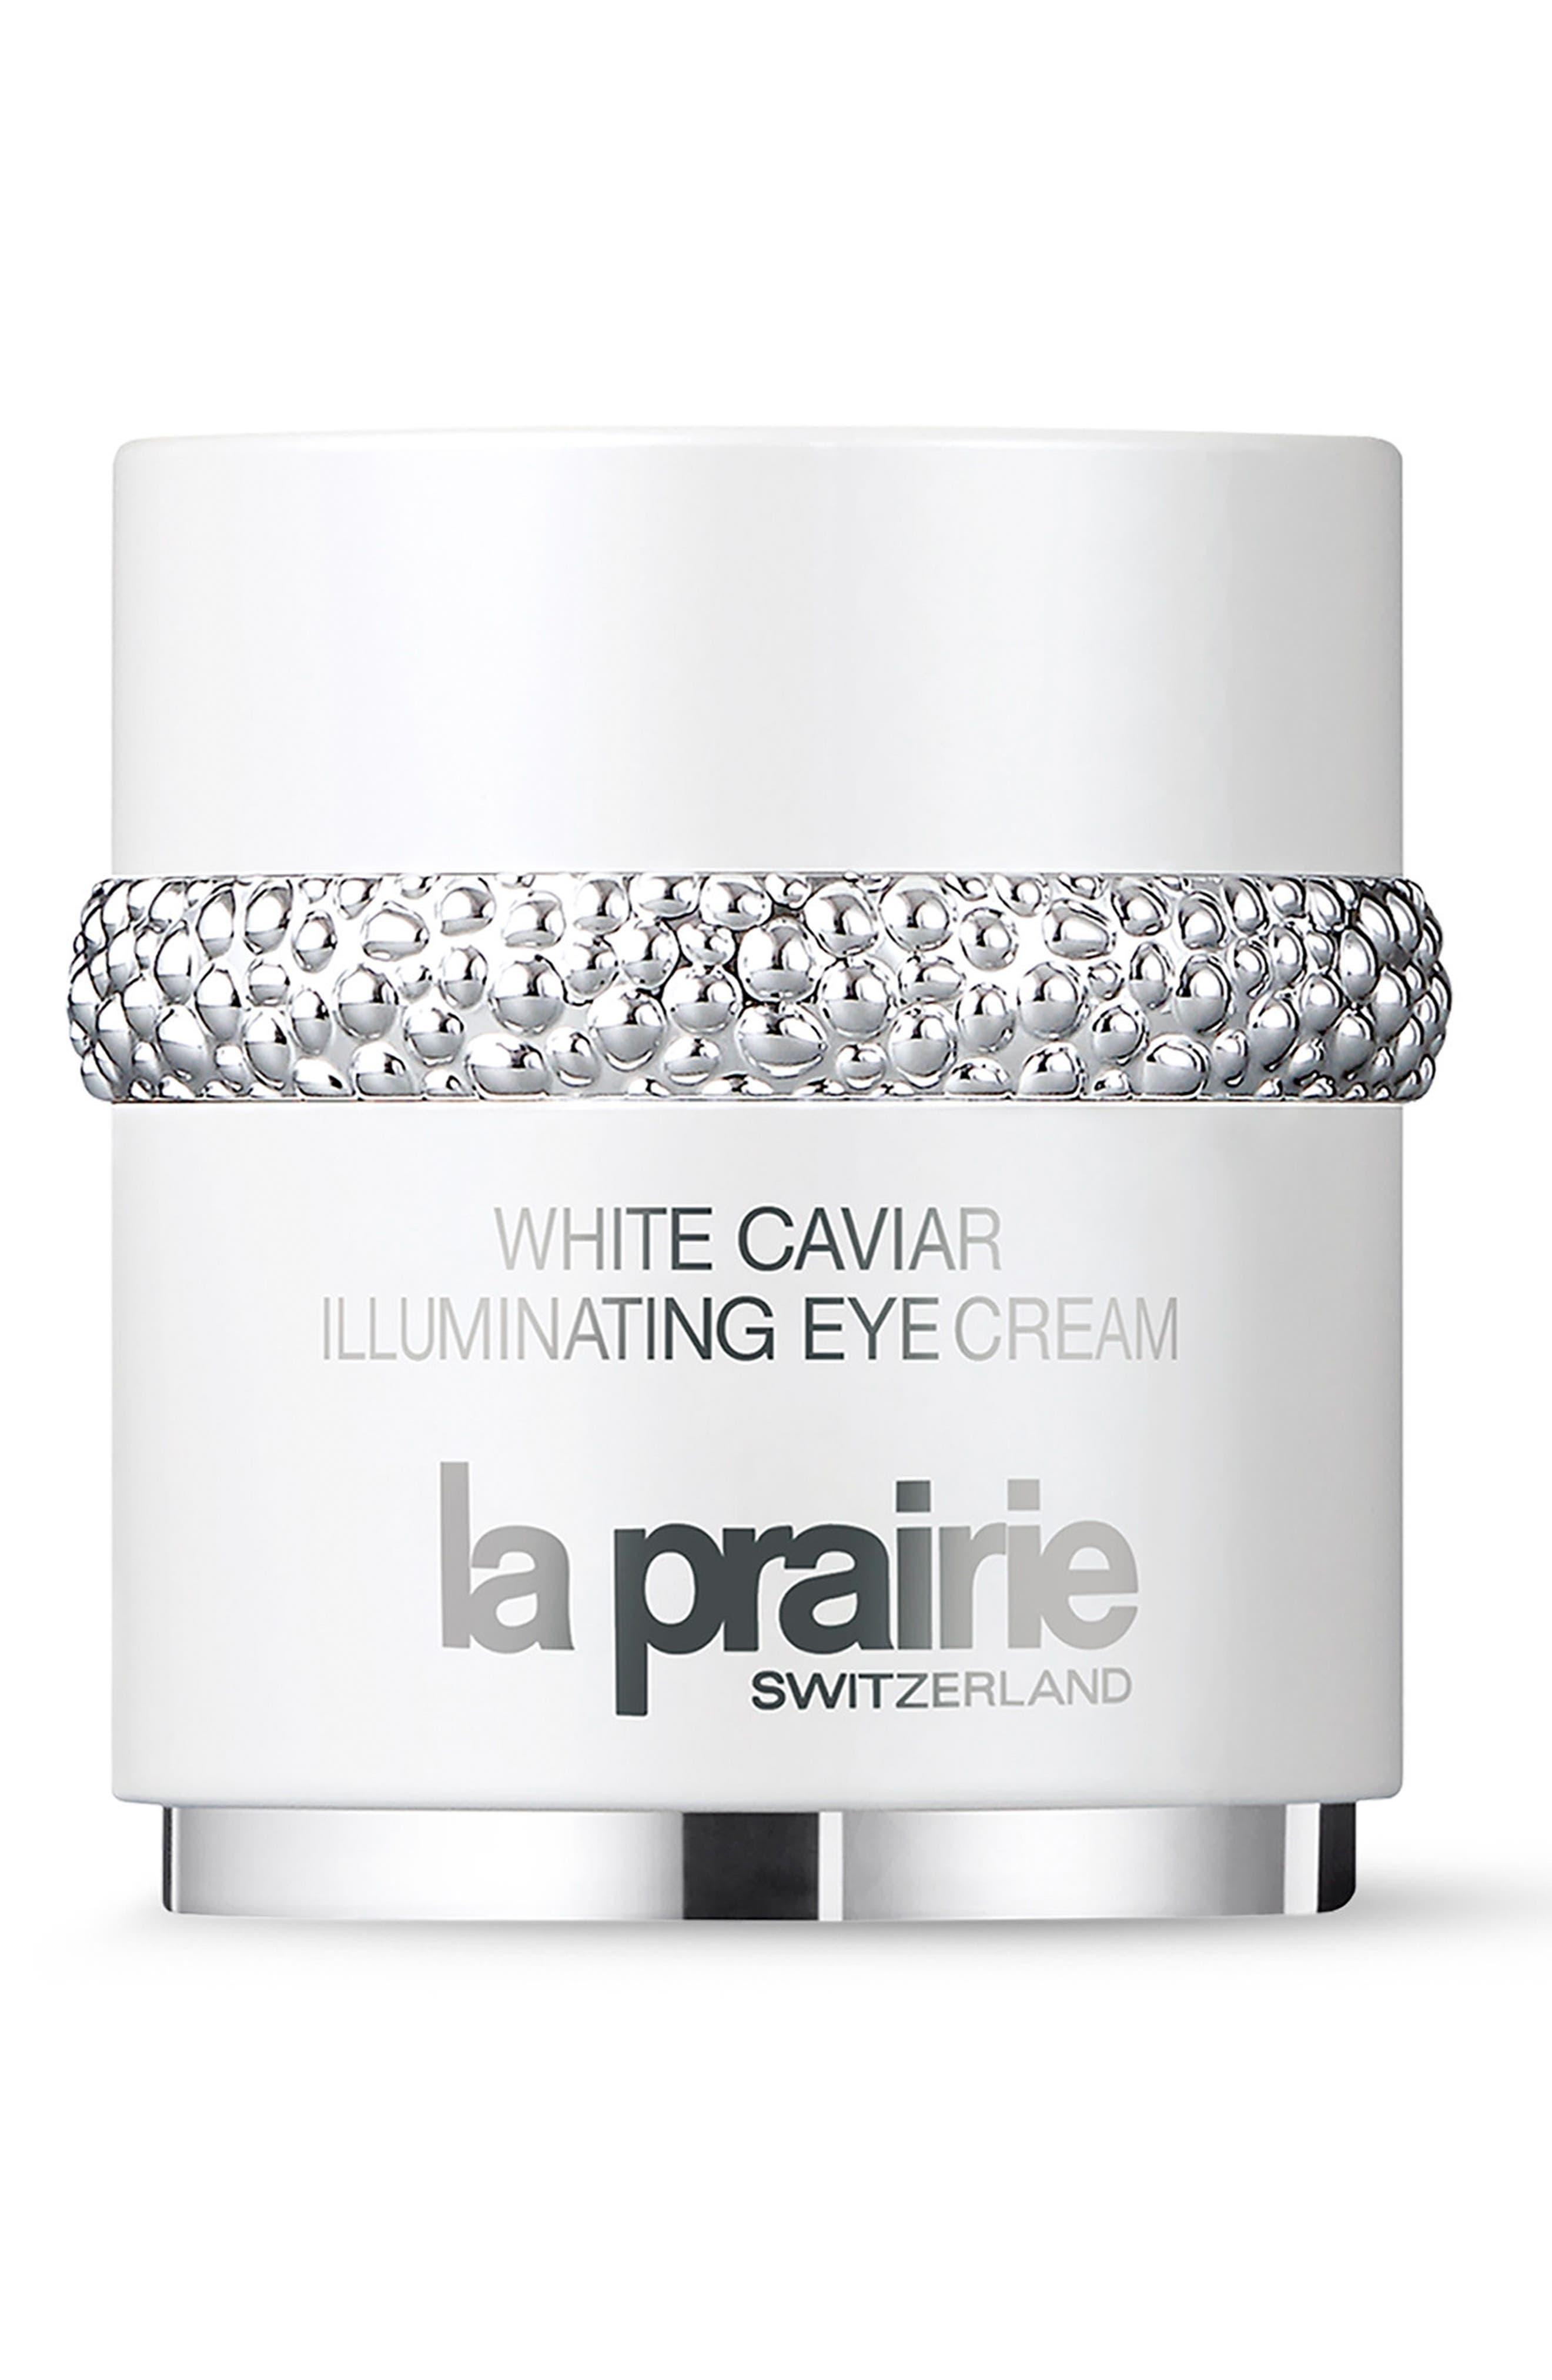 Alternate Image 1 Selected - La Prairie White Caviar Illuminating Eye Cream